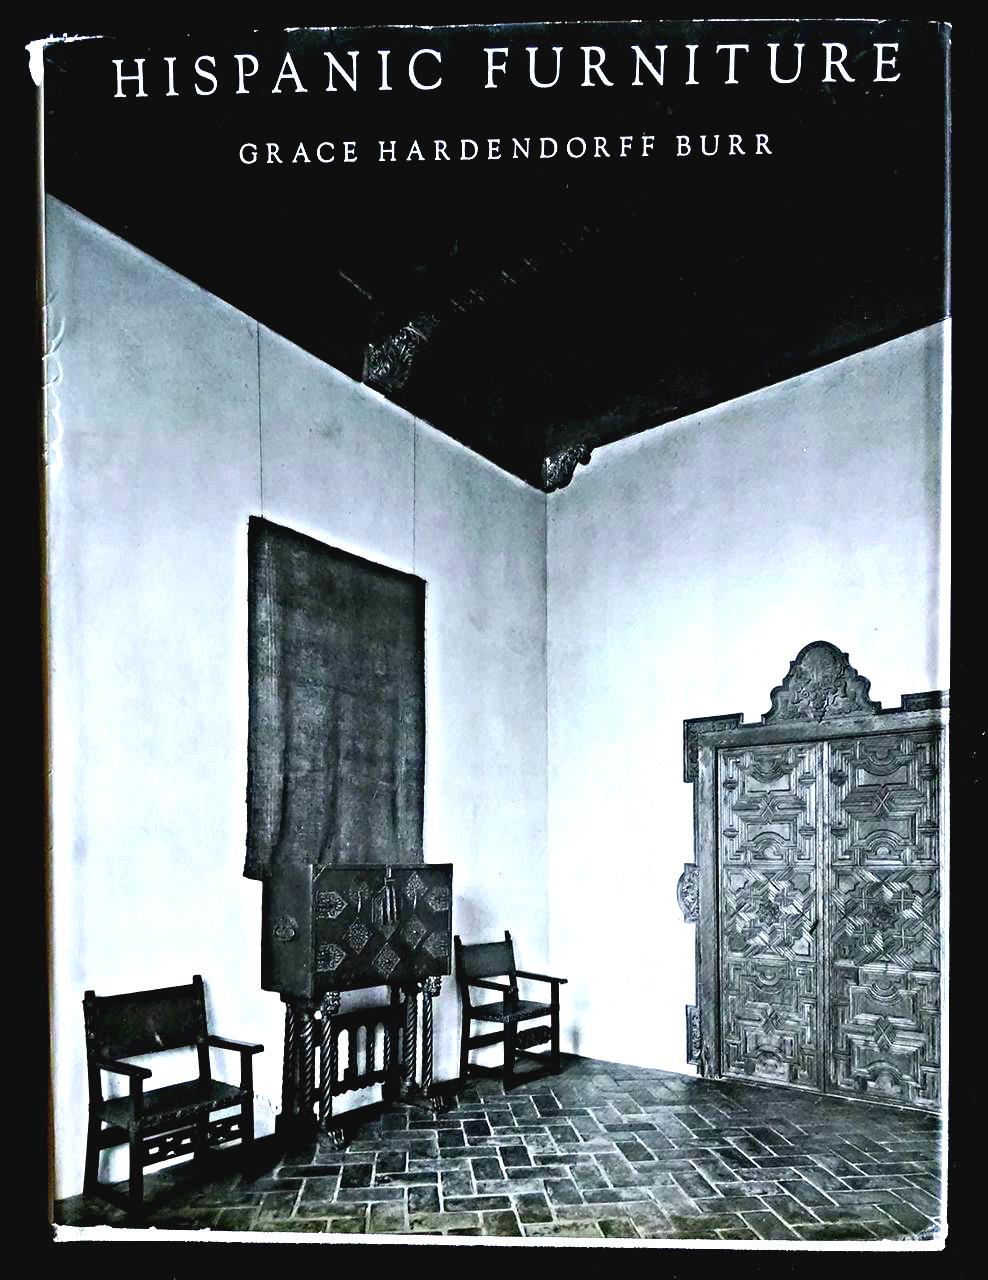 . HISPANIC FURNITURE 15th 18thC  by Grace Hardenoreff Burr  1964  Rev 2nd Ed